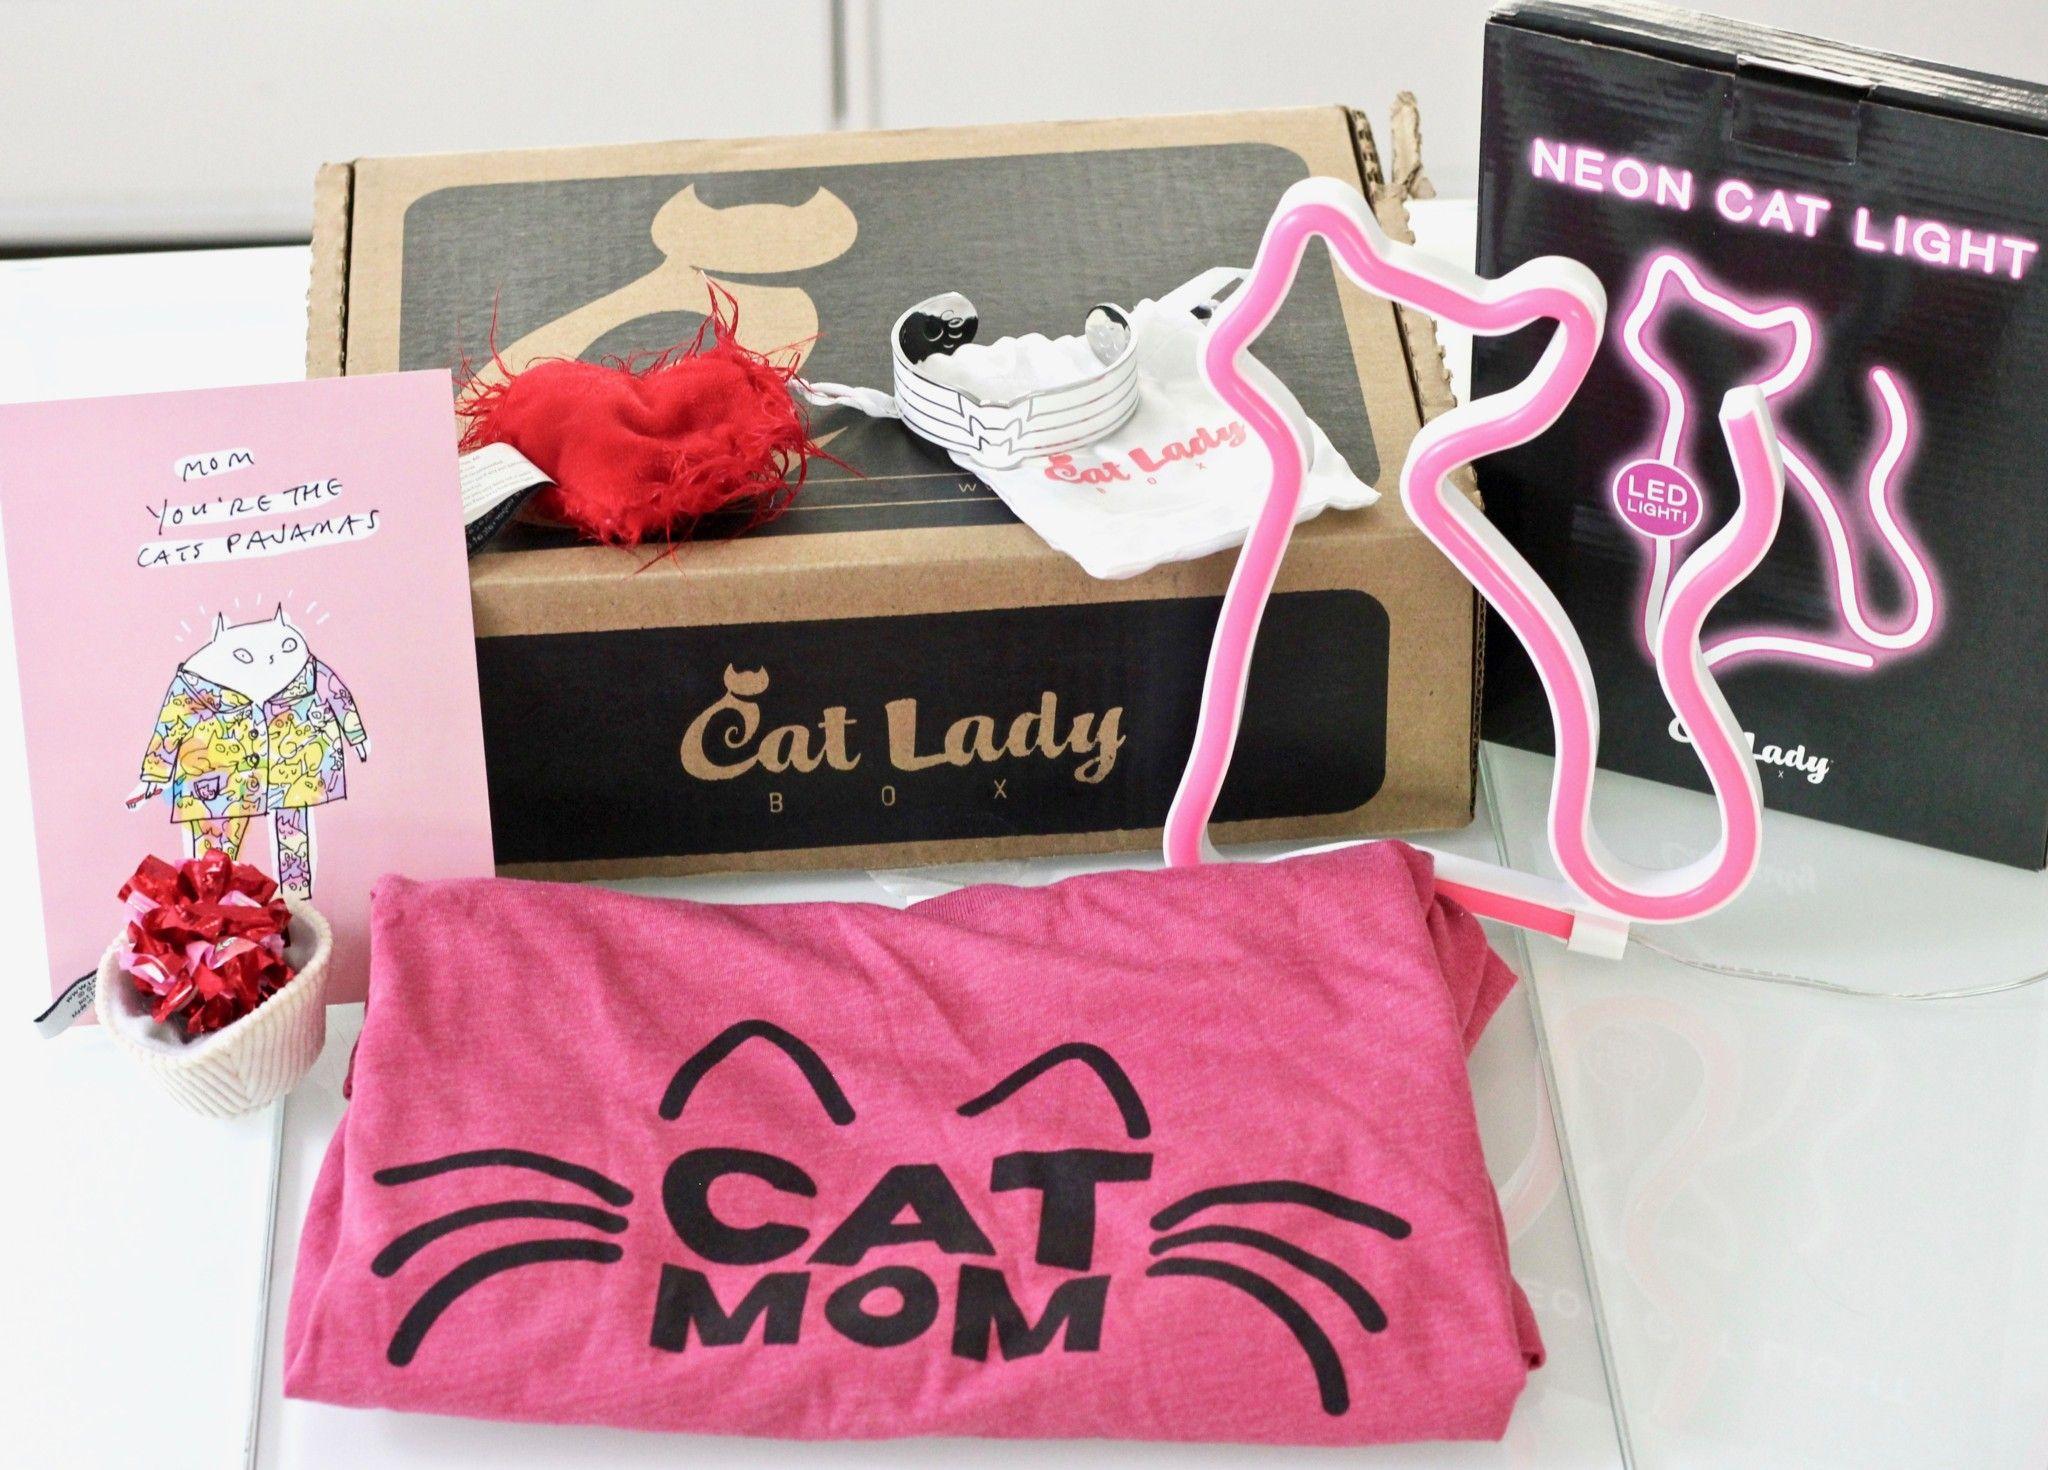 May 2019 Crazy CatLadyBox Review Neon cat, Buy a kitten